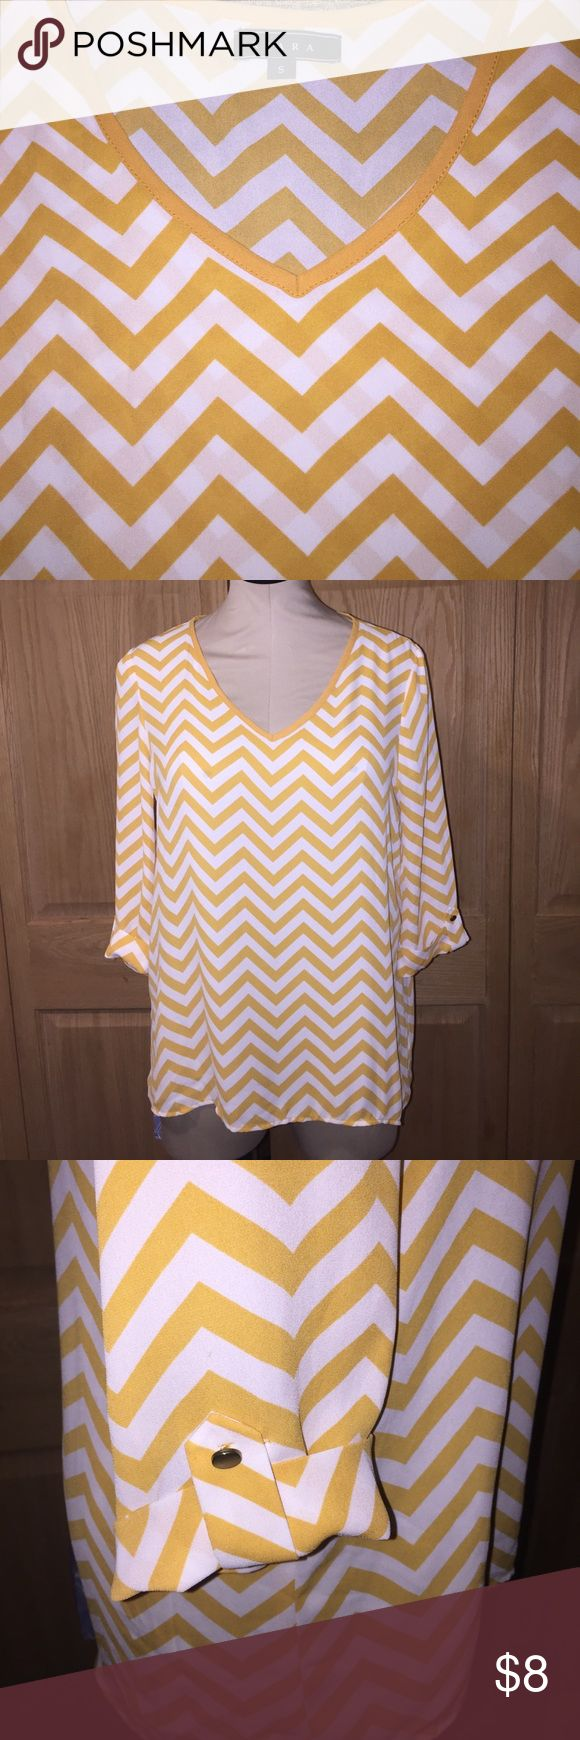 Kiara mustard yellow and white chevron shirt Chevron three quarters length shirt dressy top size small juniors kiara Tops Blouses